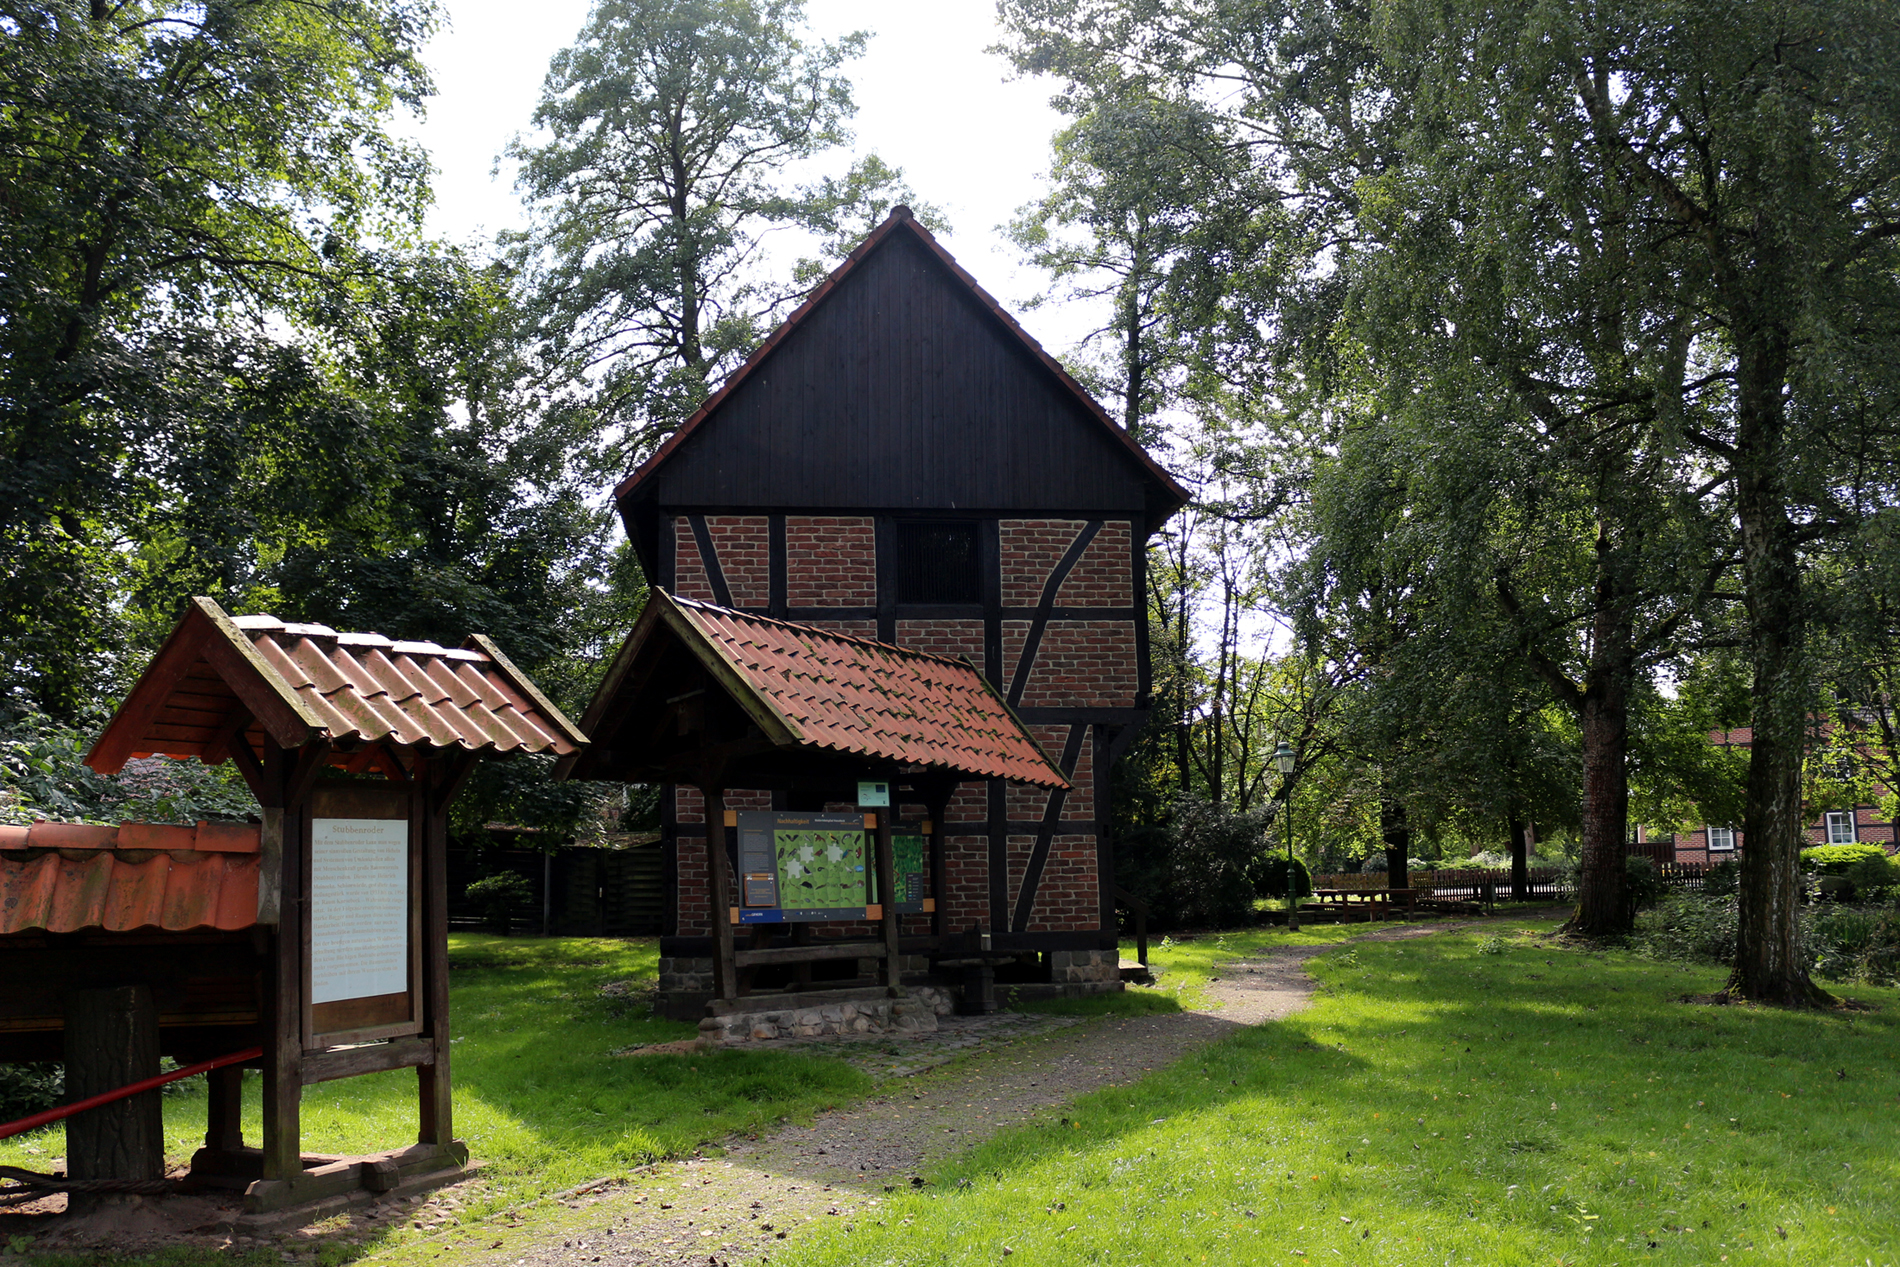 Haus der Landschaft - Hinweistafel